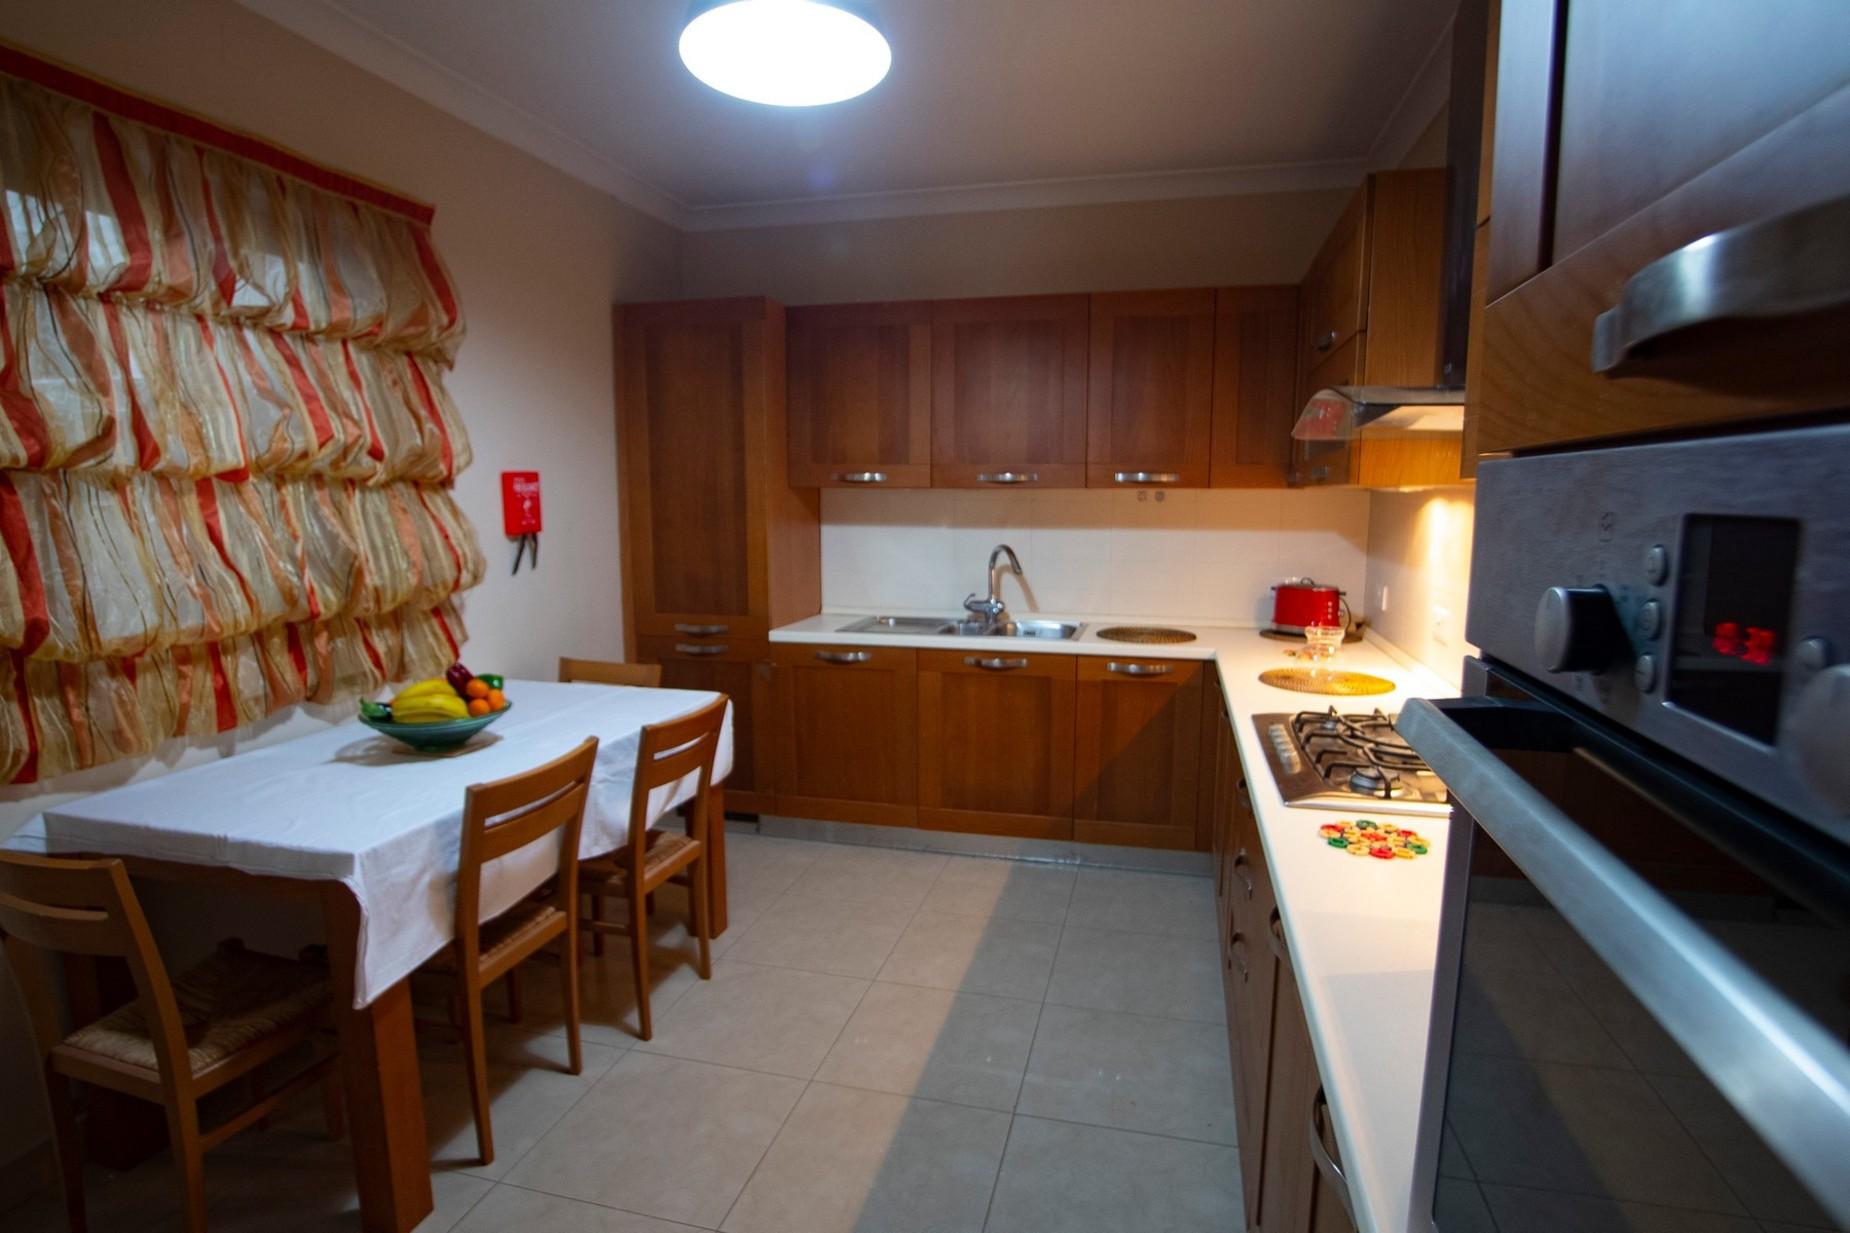 4 bed Apartment For Rent in Naxxar, Naxxar - thumb 5